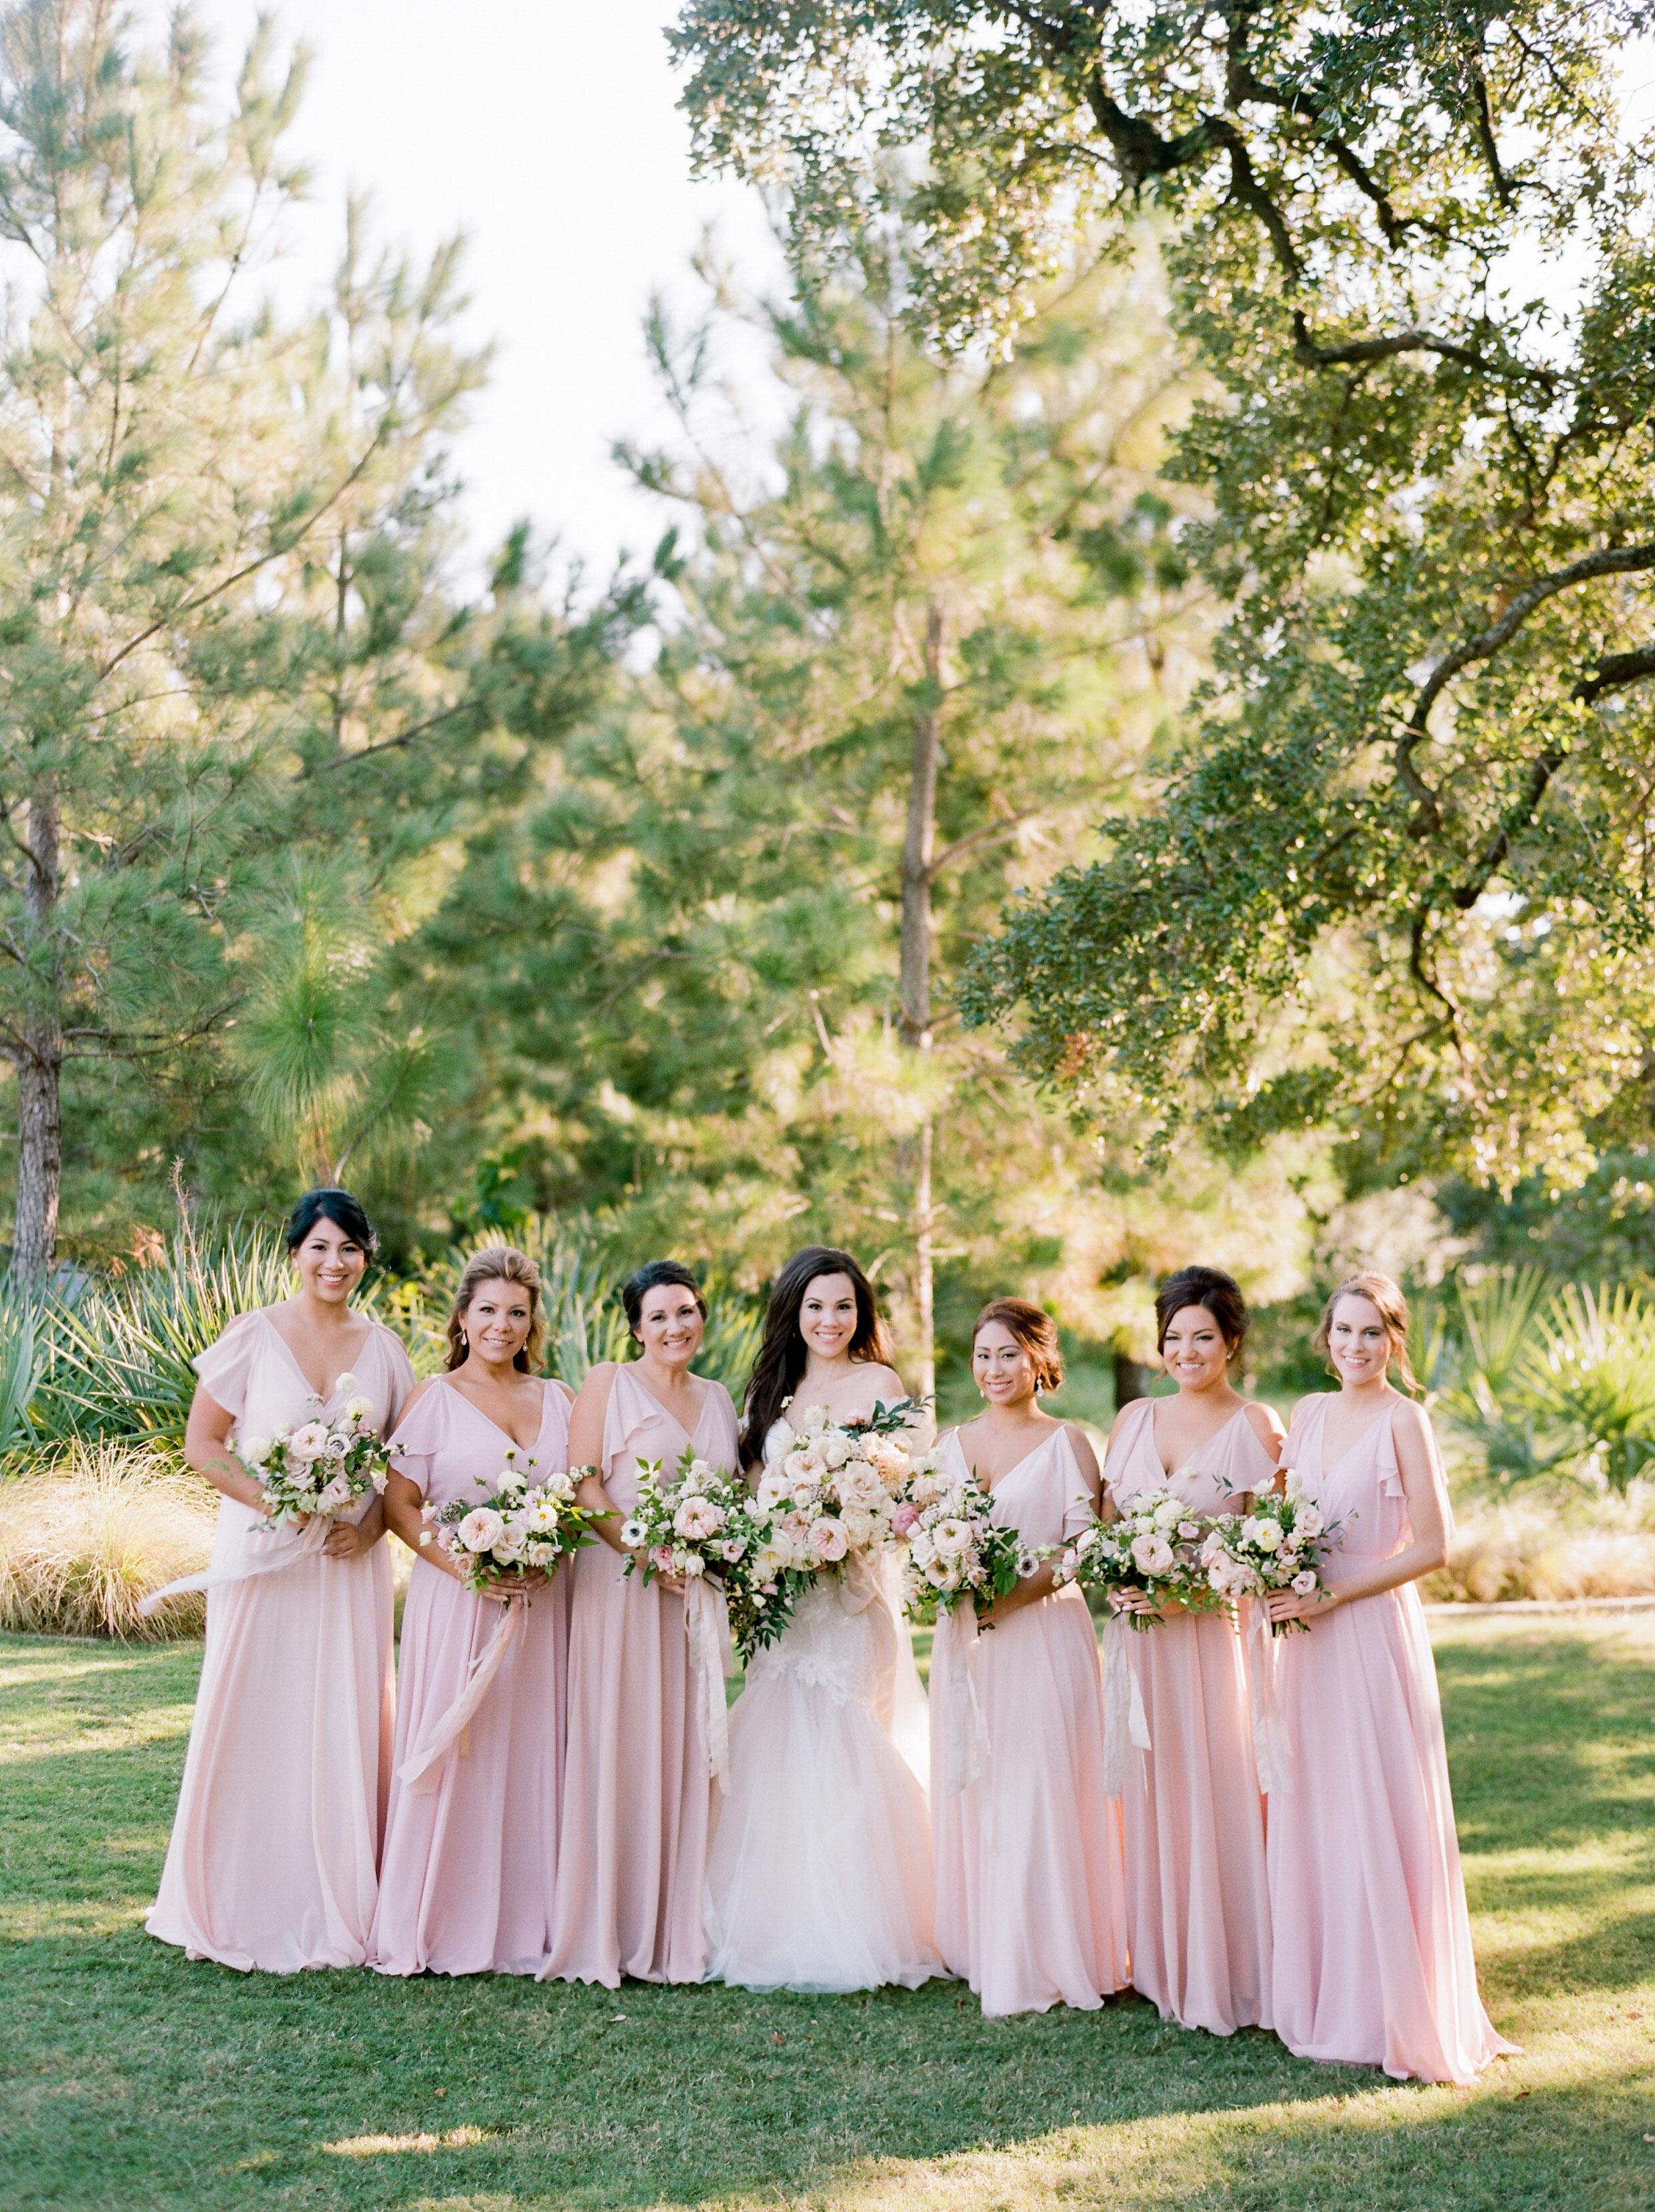 Martha-Stewart-Wedding-Dana-Fernandez-Photography-Josh-Texas-Film-Houston-Wedding-Fine-Art-Photographer-McGovern-Centennial-Gardens-Top-Best-181.jpg